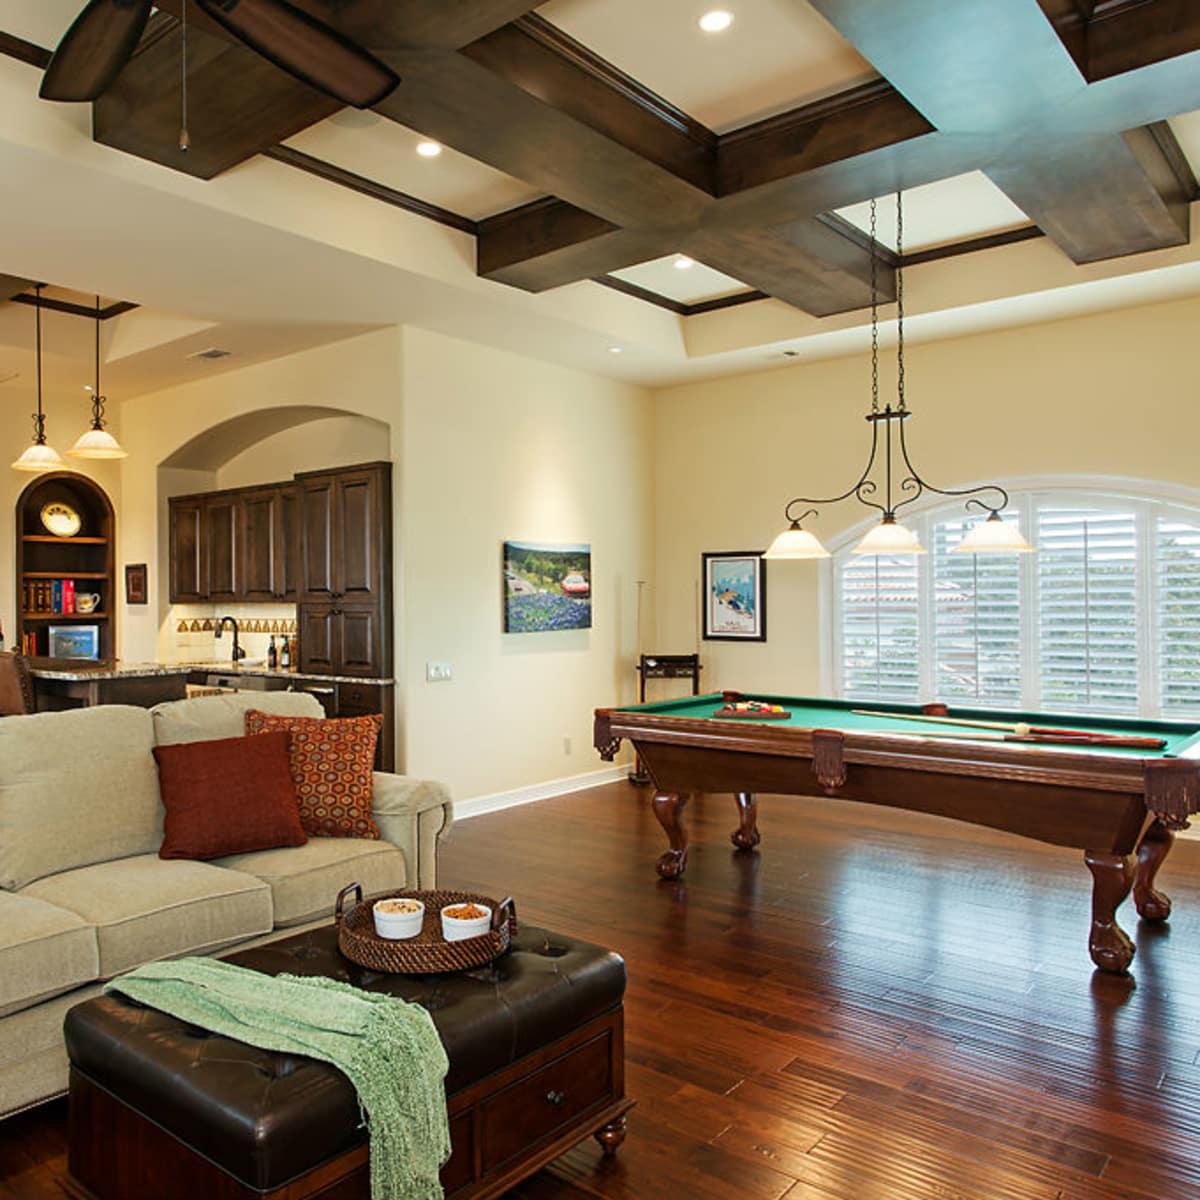 CG&S Austin home design-build